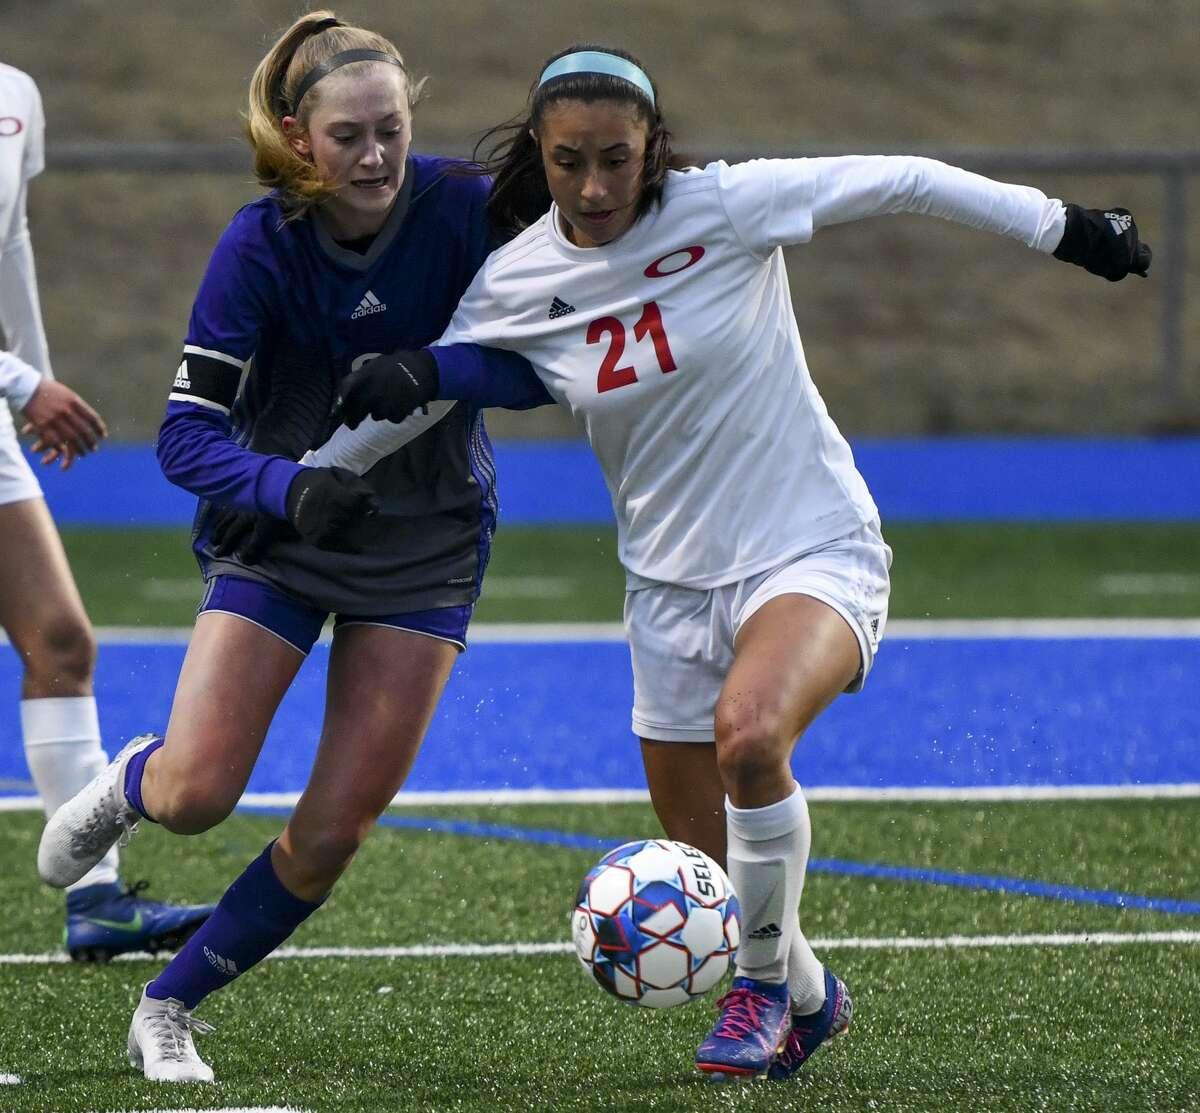 Midland High's Hannah Ware battles Odessa High's Yareli Barrera (21) for the ball on Tuesday, Feb. 11, 2020 at Grande Communications Stadium.